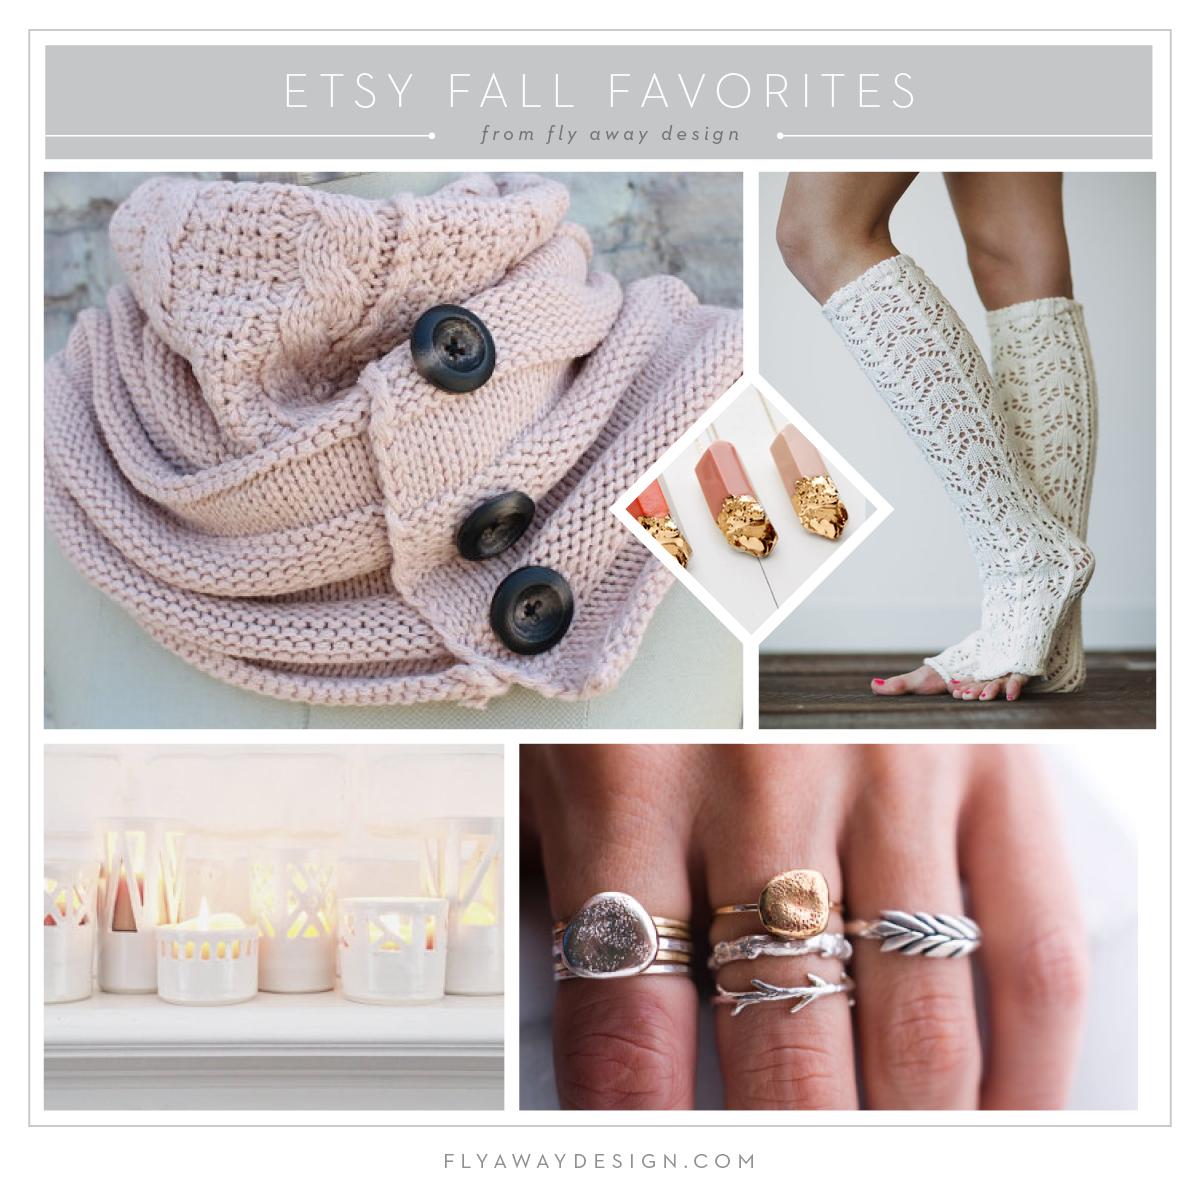 etsy_fall_favorites.jpg